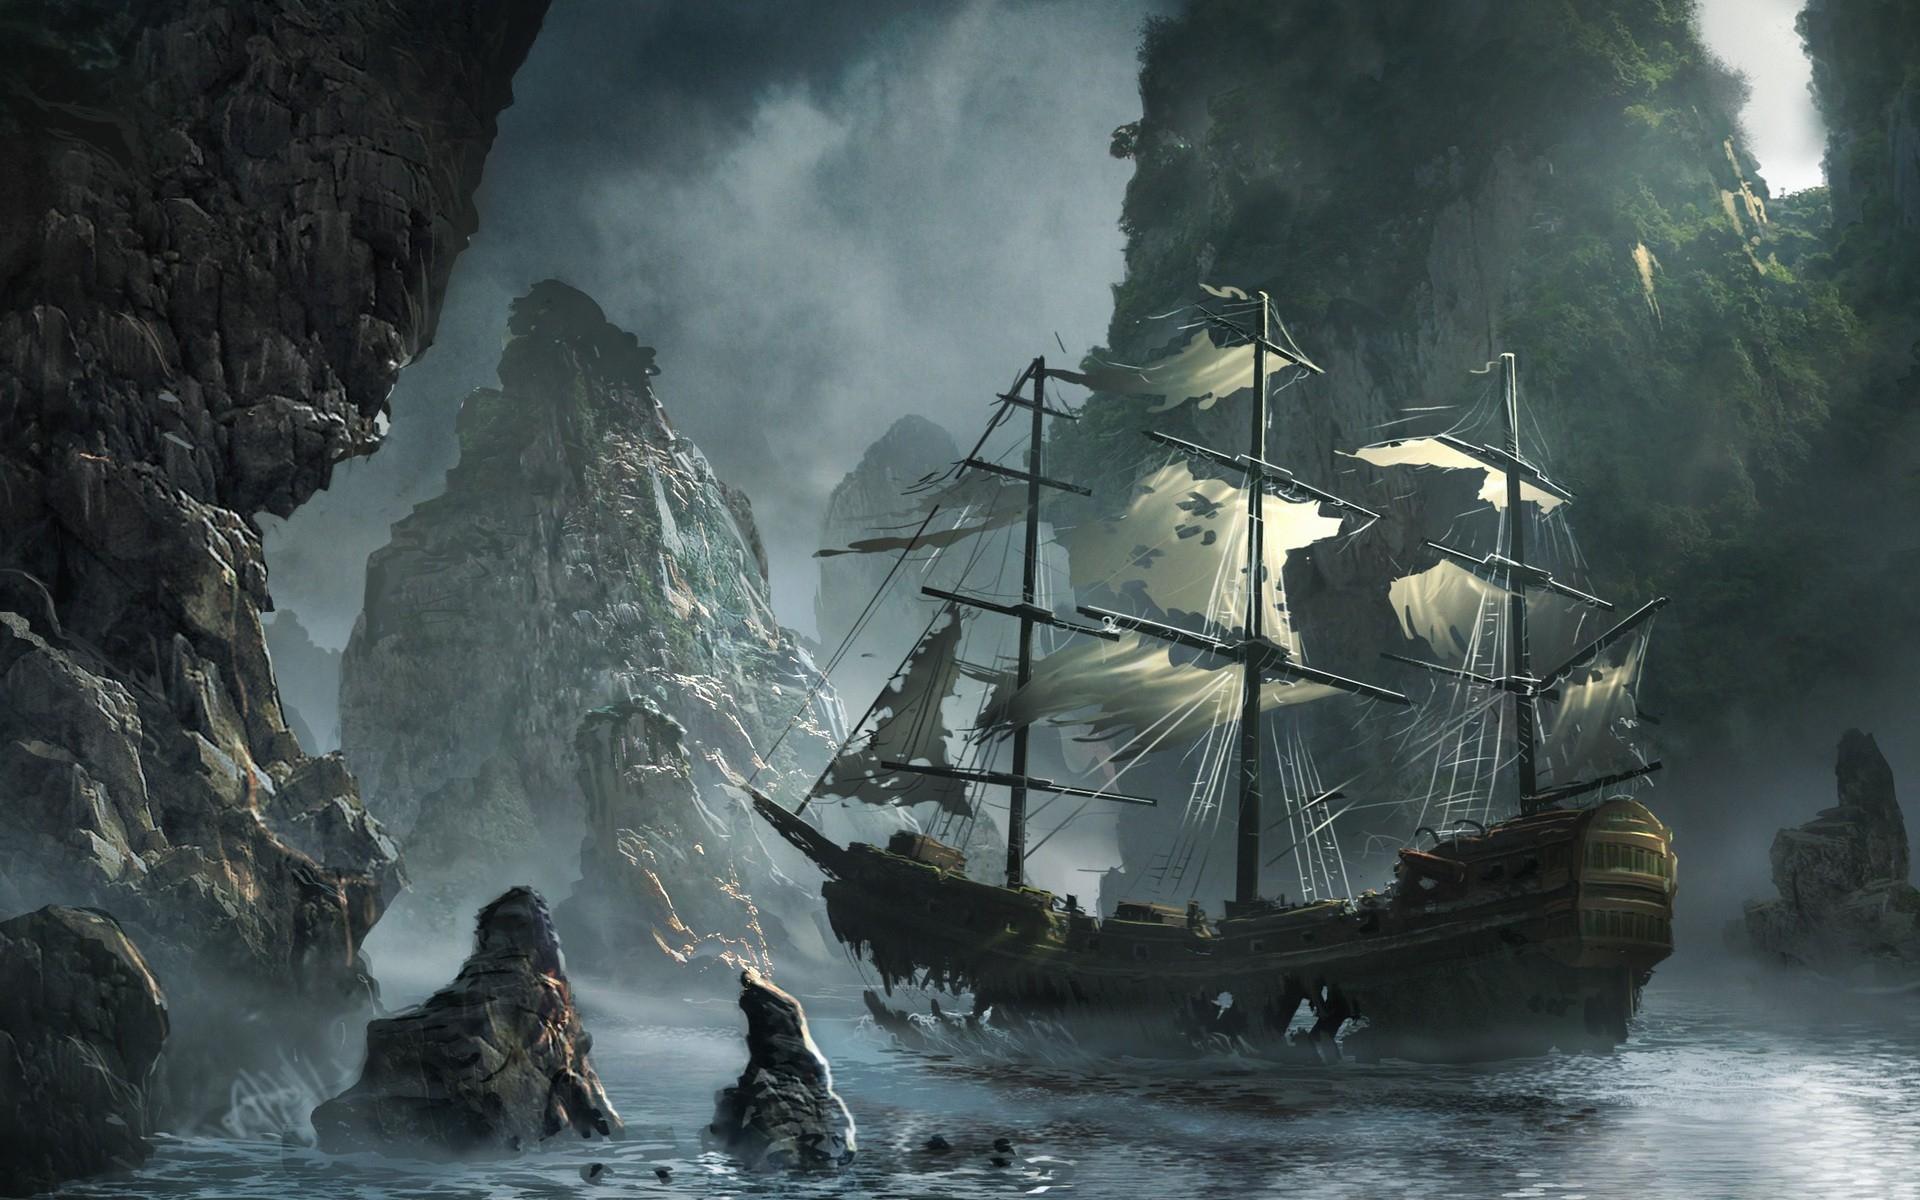 artwork sail ship abandoned bay sails water body wallpaper background 1920x1200